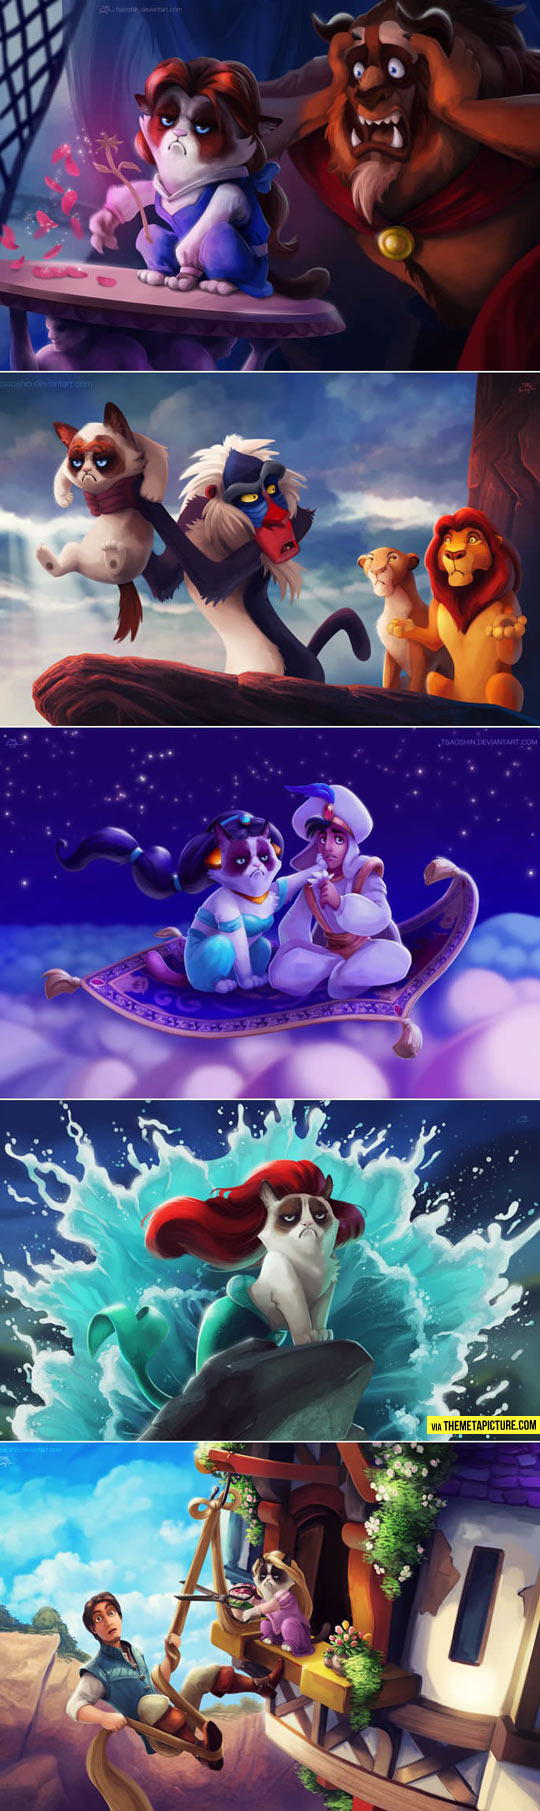 Grumpy Cat in Disney Movies…